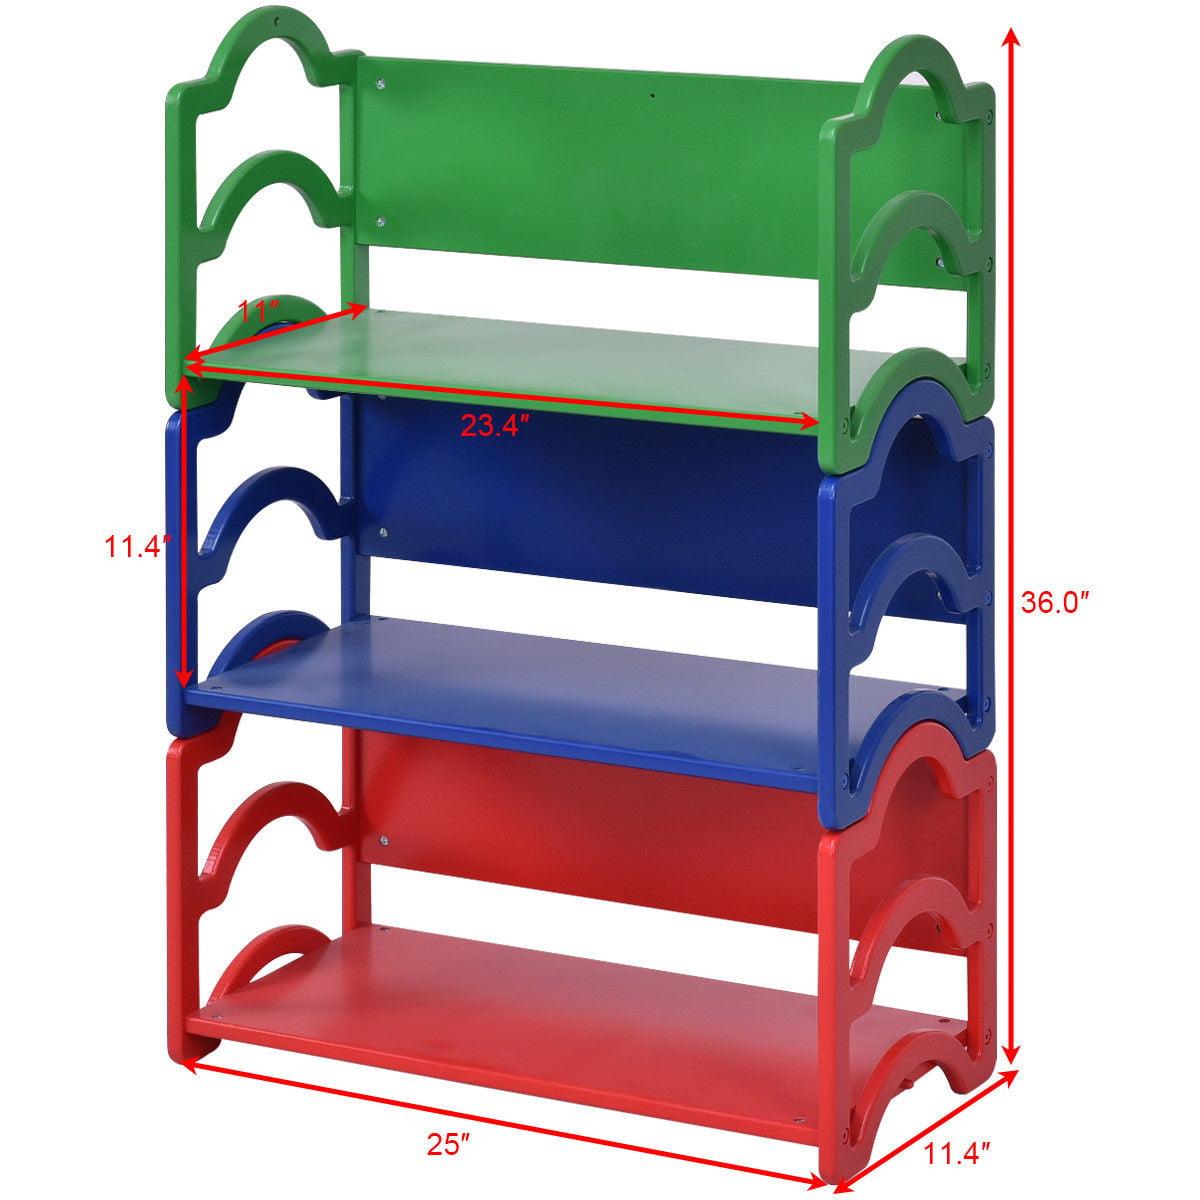 Gymax Kids Book Shelf Storage Rack Organizer Bookcase Display Holder Home Furniture - image 9 of 10